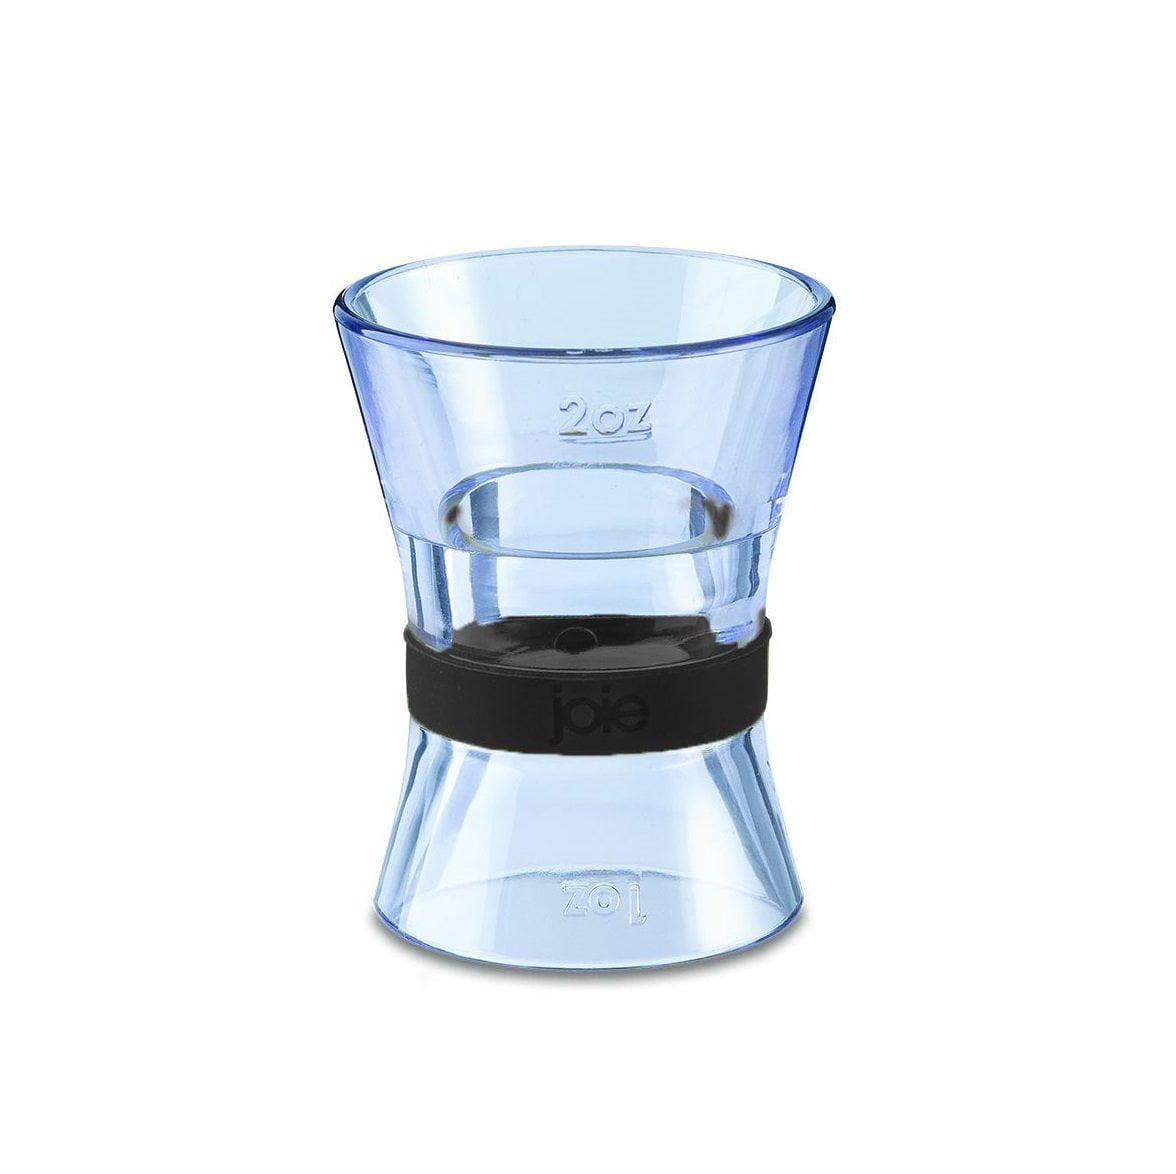 Joie Double Sided Cocktail Jigger Liquor Drink Measuring Cup 5 1 2 Oz Walmart Com Walmart Com